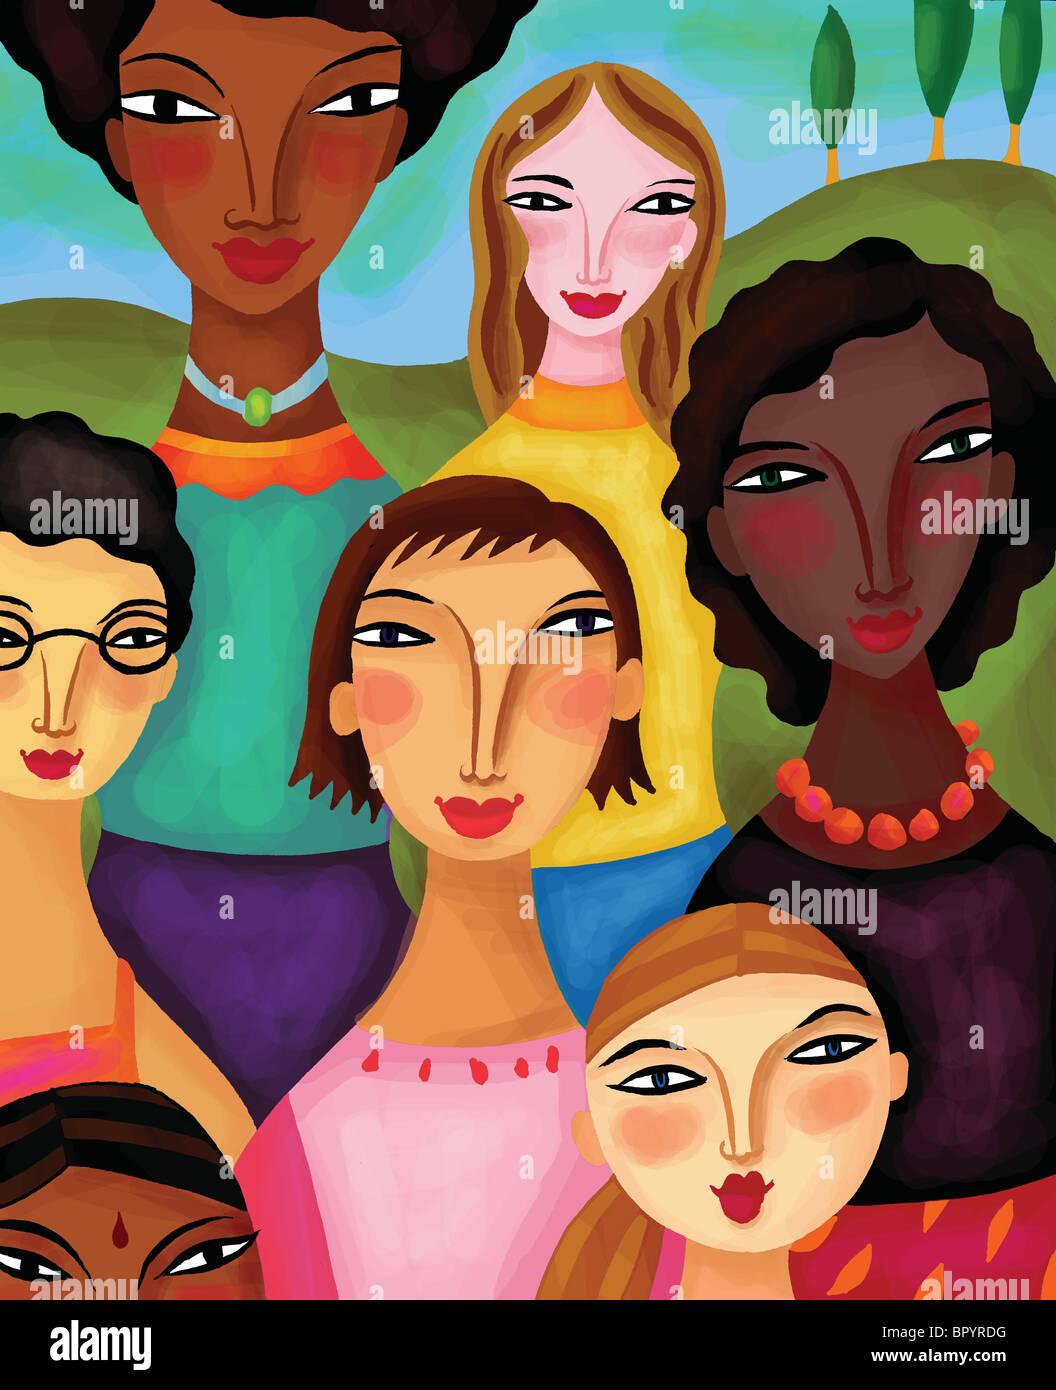 Mujeres de diferentes etnias juntos Imagen De Stock